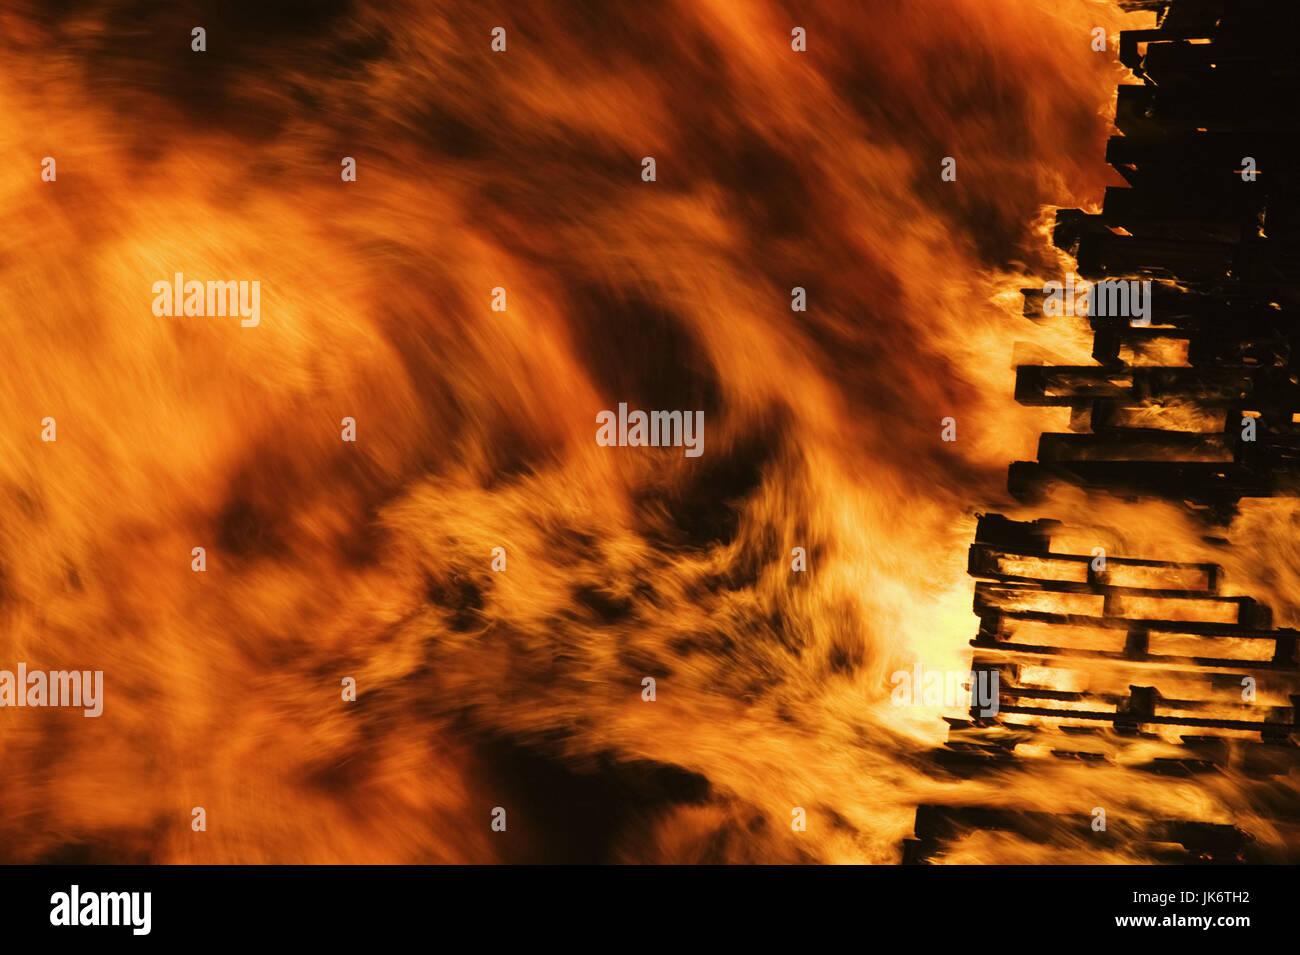 Feuer, Flammen Mau_Set, Holzpaletten, Paletten, Holz, brennen, lodern, Freudenfeuer, Marca Hitze, Zerstörung, Immagini Stock